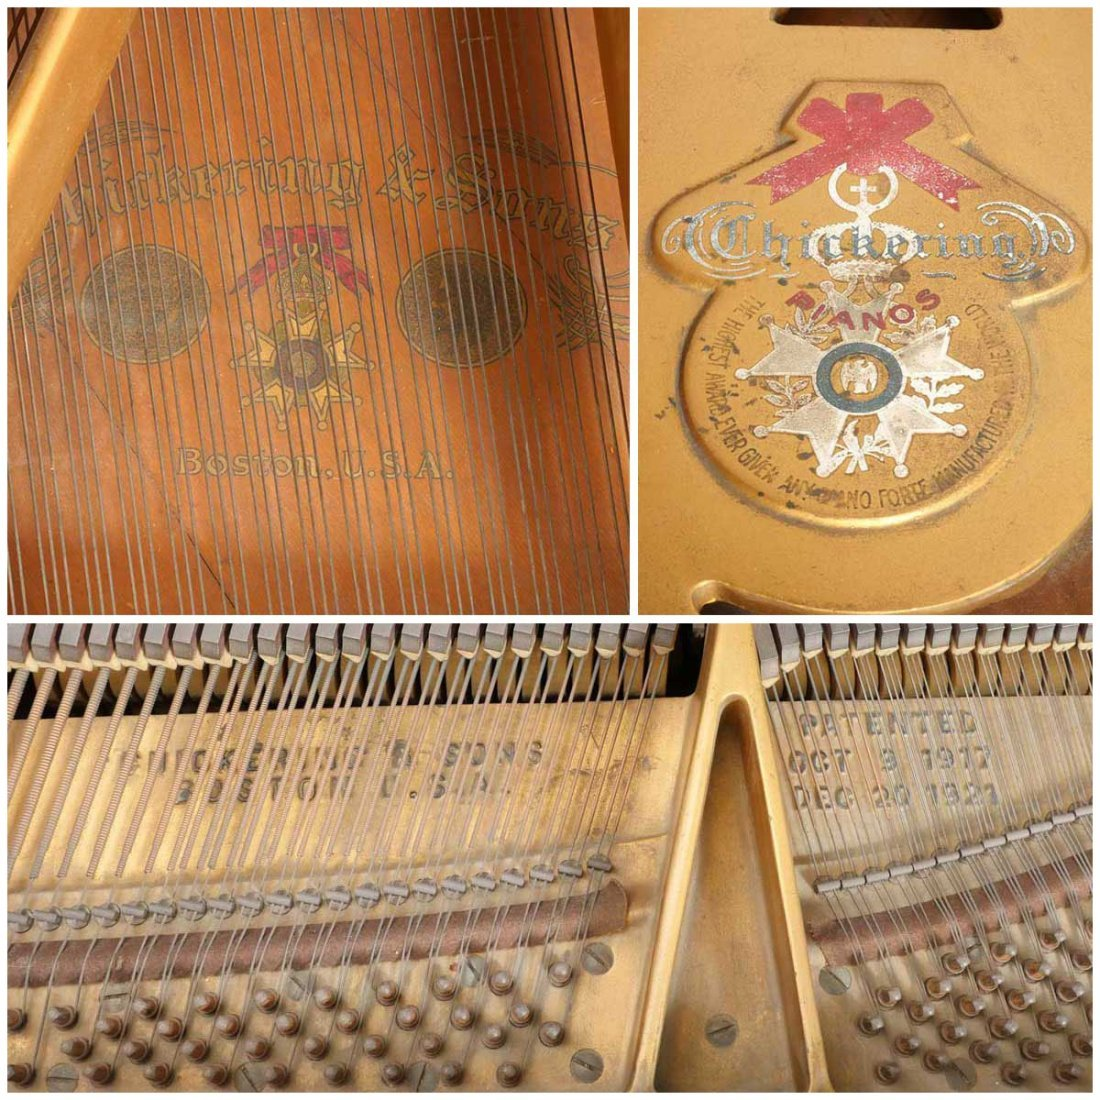 CHICKERING & SONS, BOSTON BABY GRAND PLAYER PIANO - 5